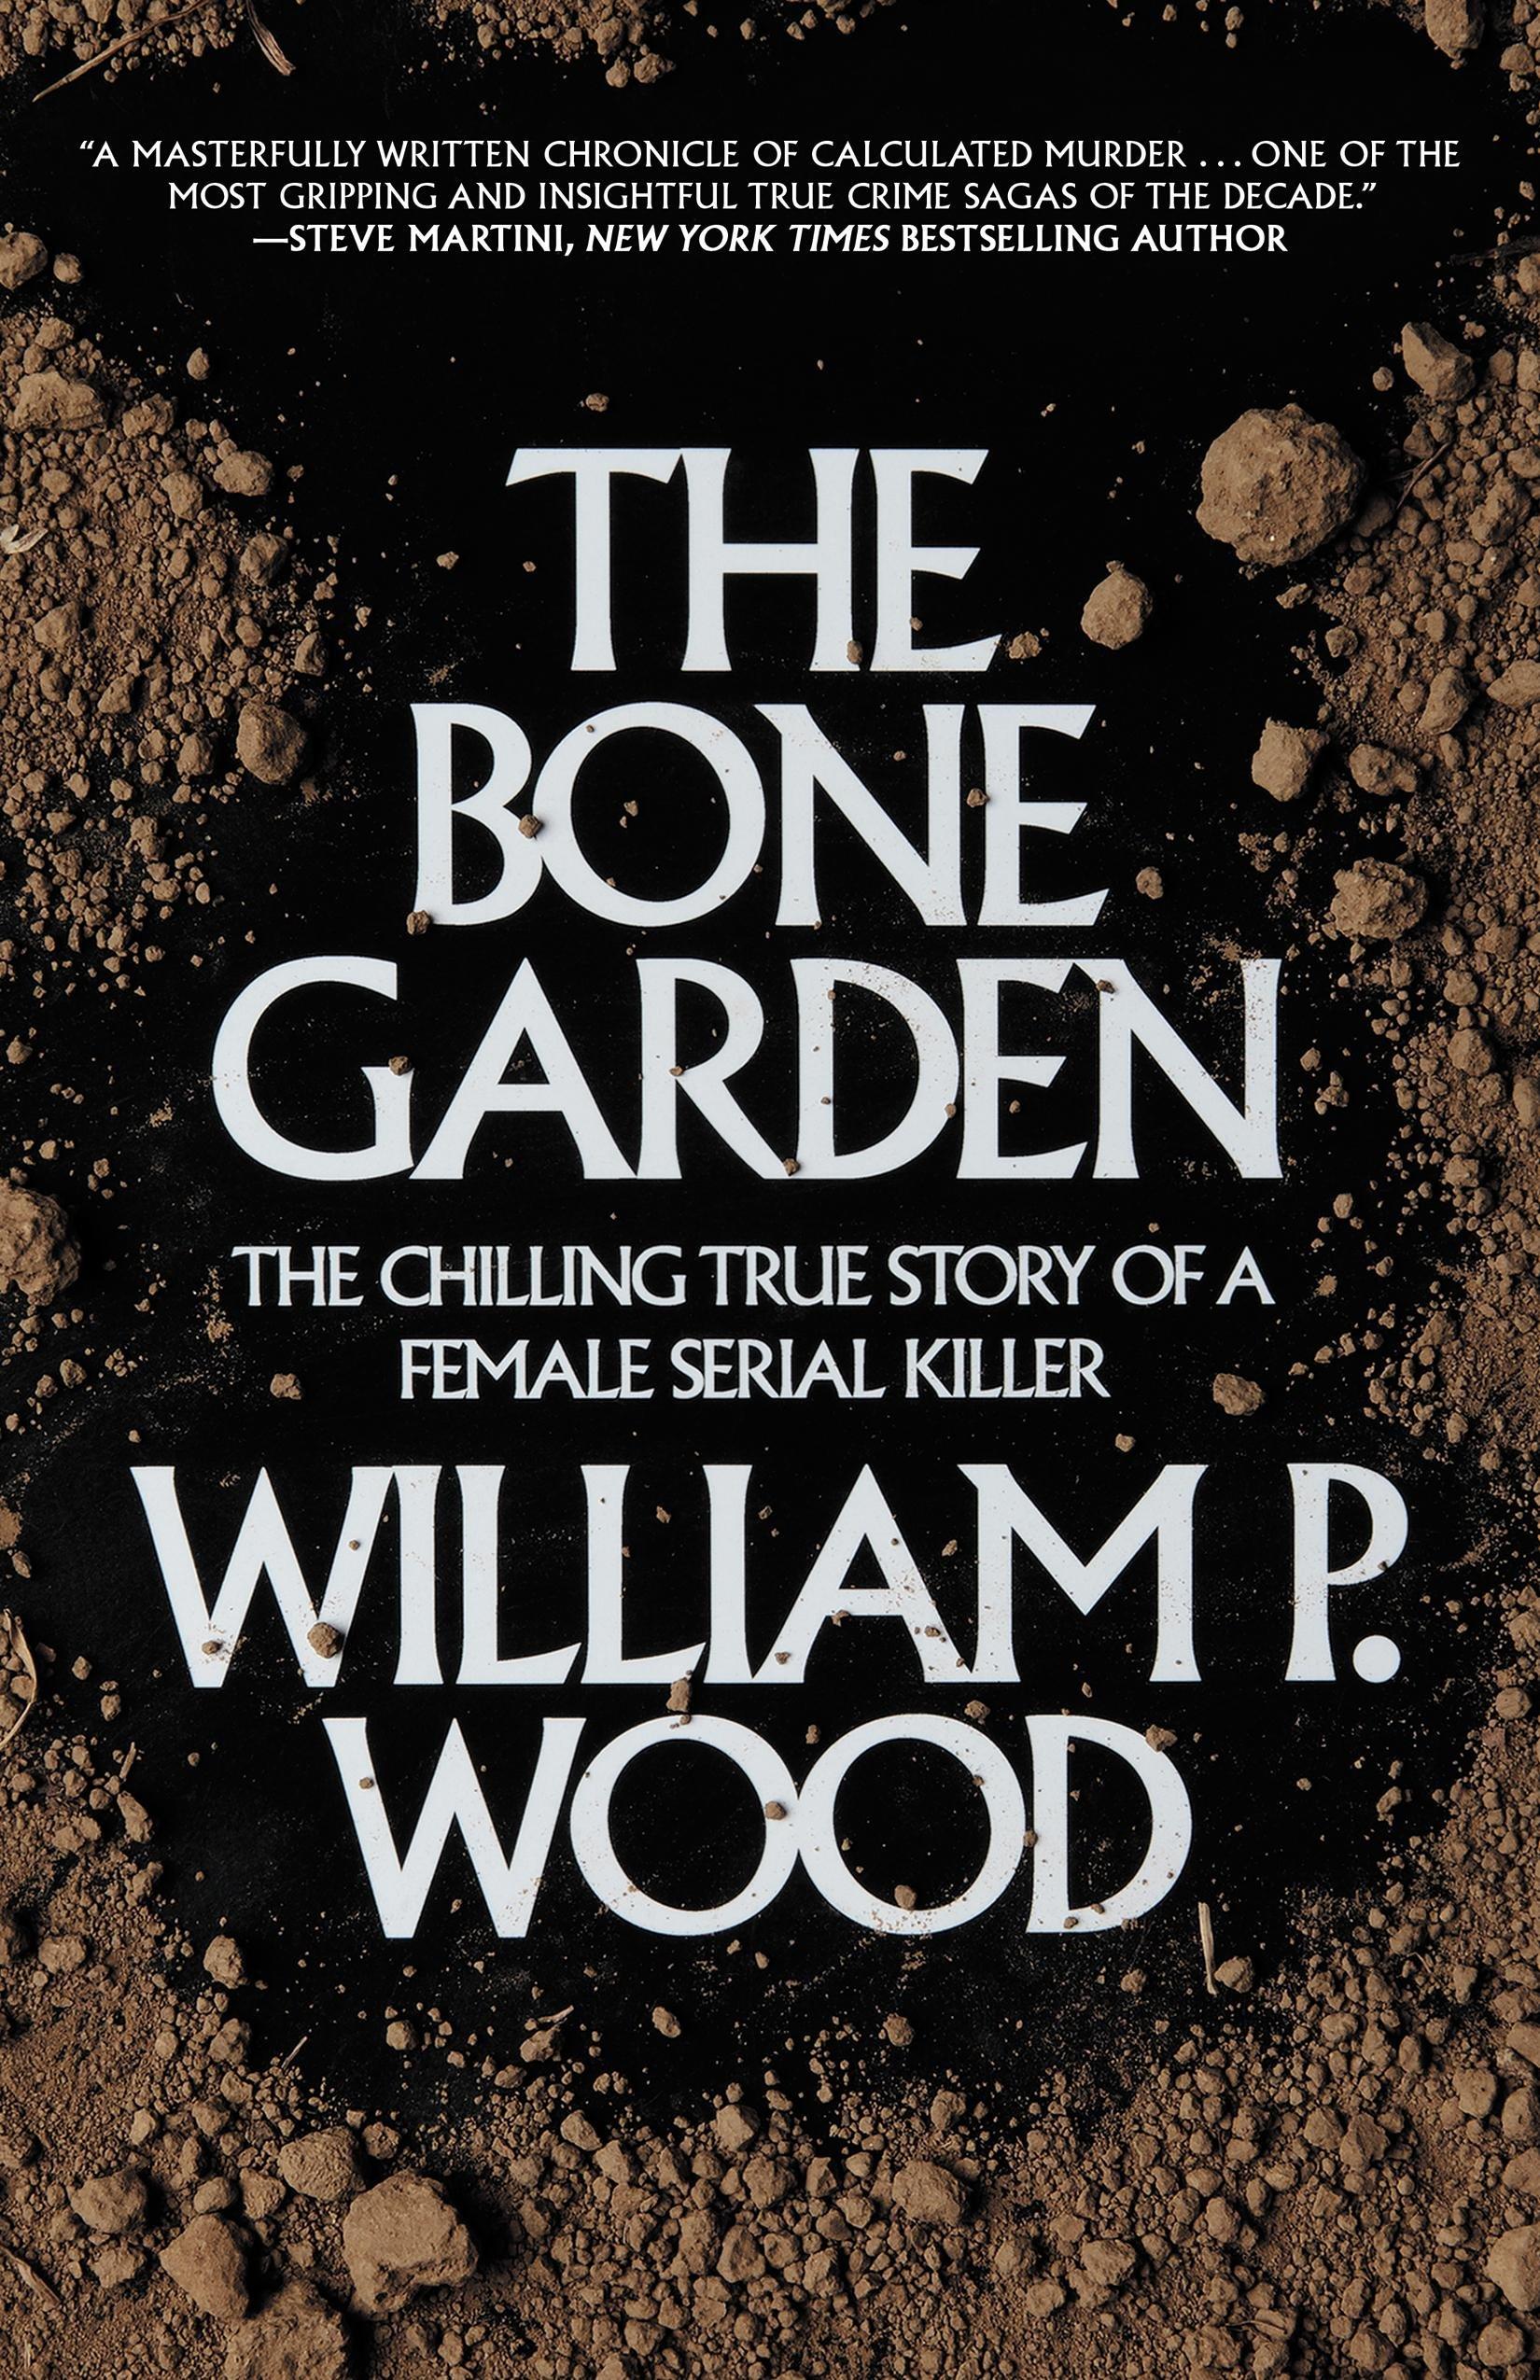 The Bone Garden: The Chilling True Story of a Female Serial Killer